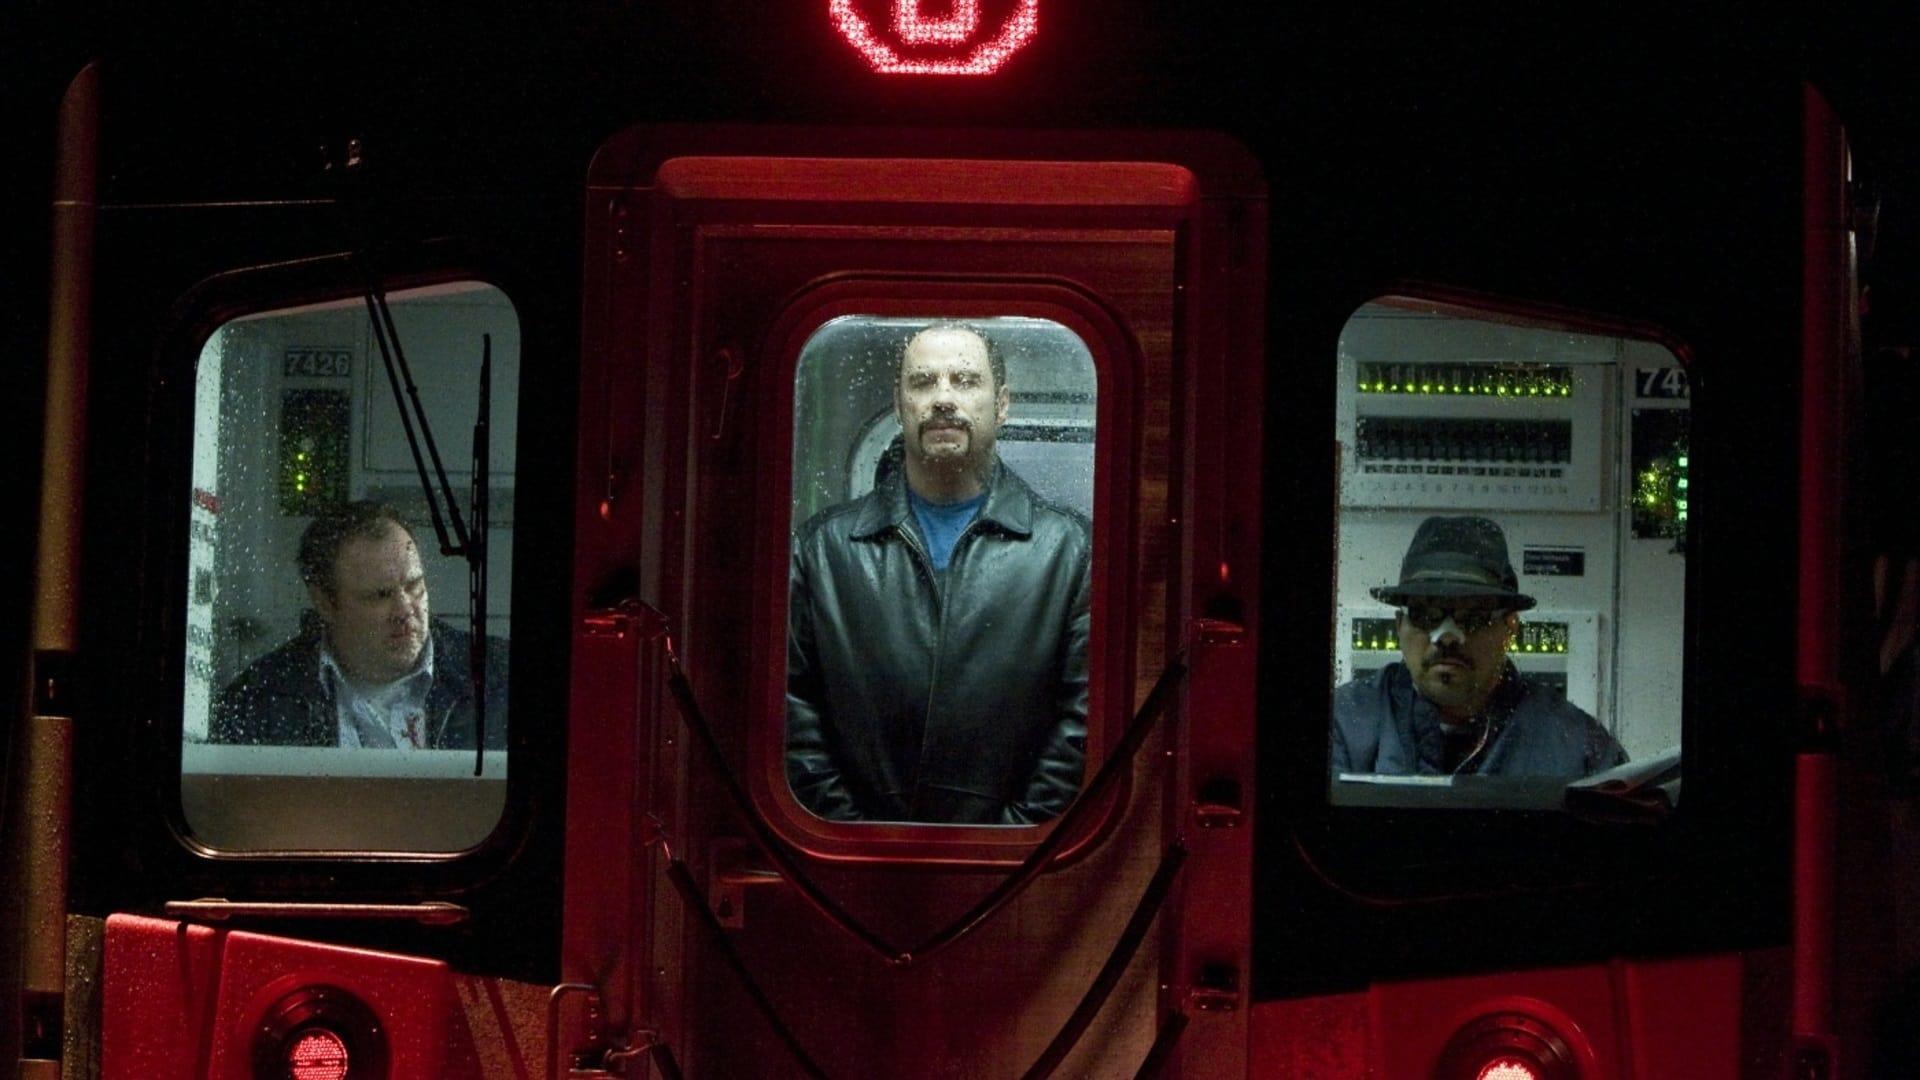 Regarder L'Attaque du métro 123 en streaming gratuit